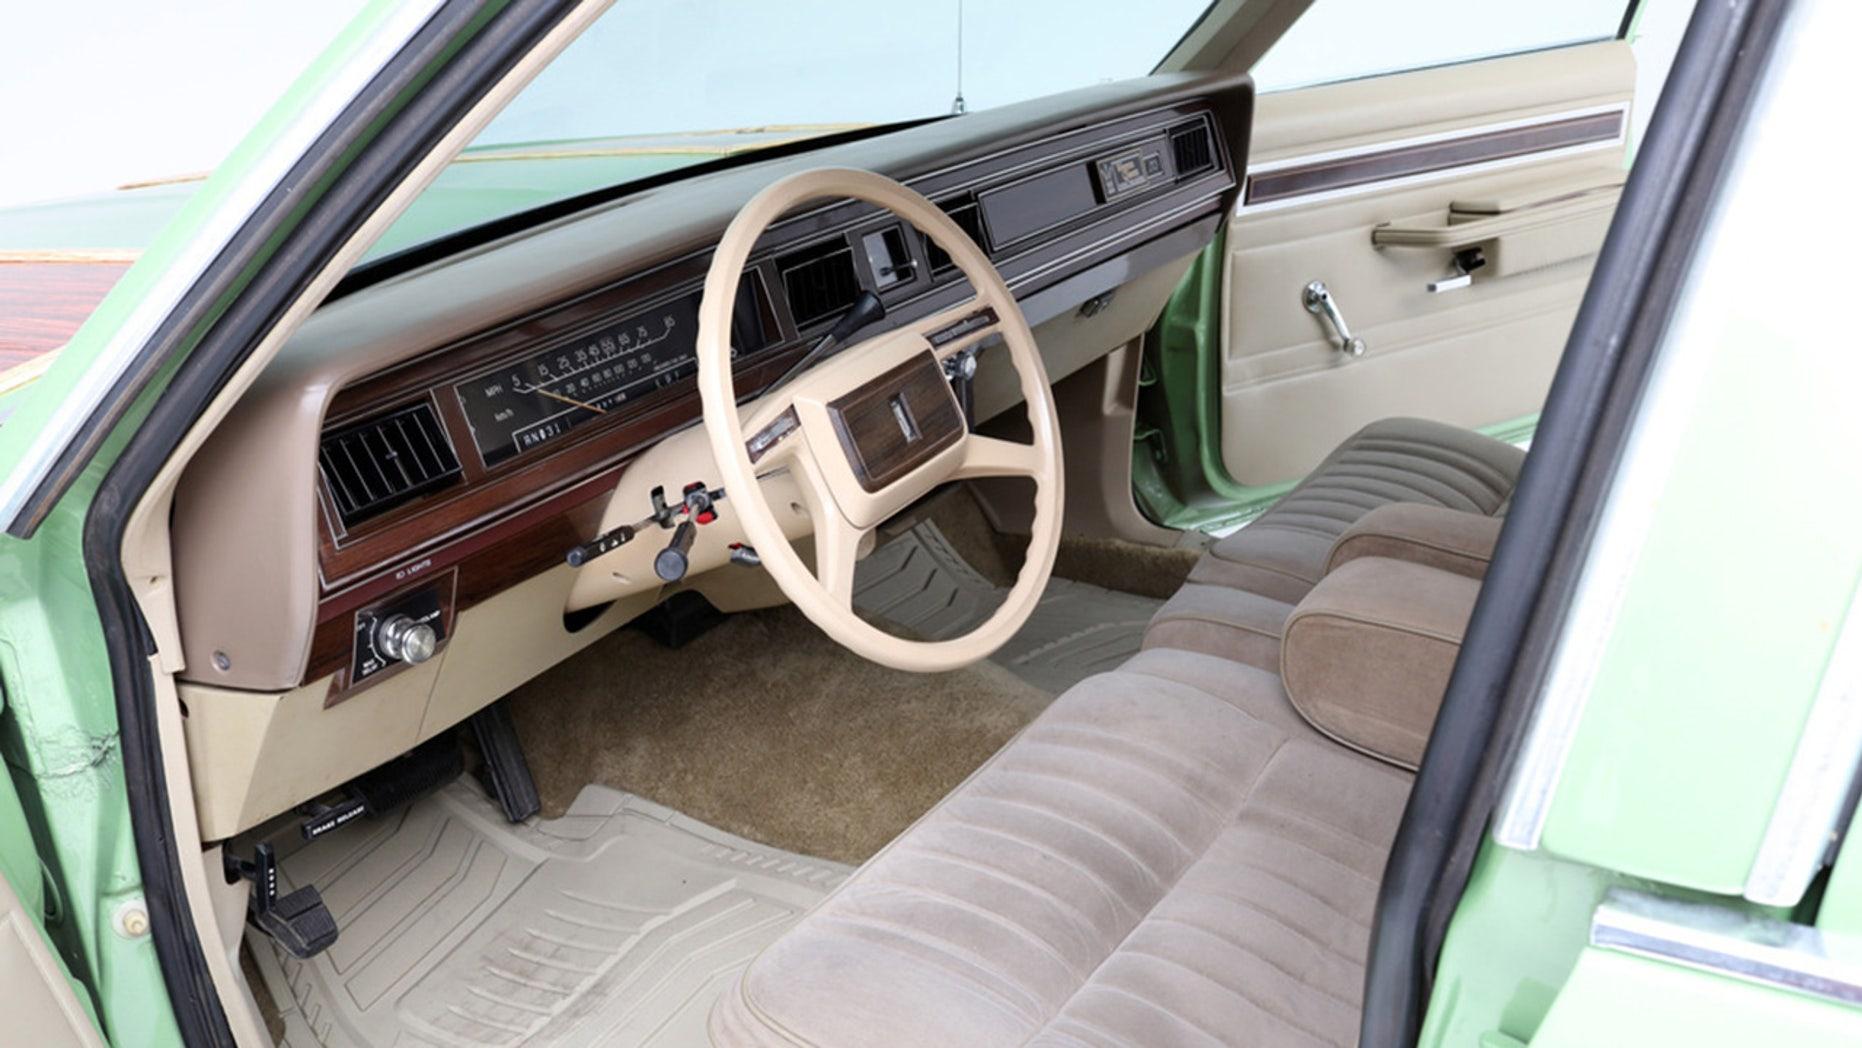 Wagon Queen Family Truckster interior